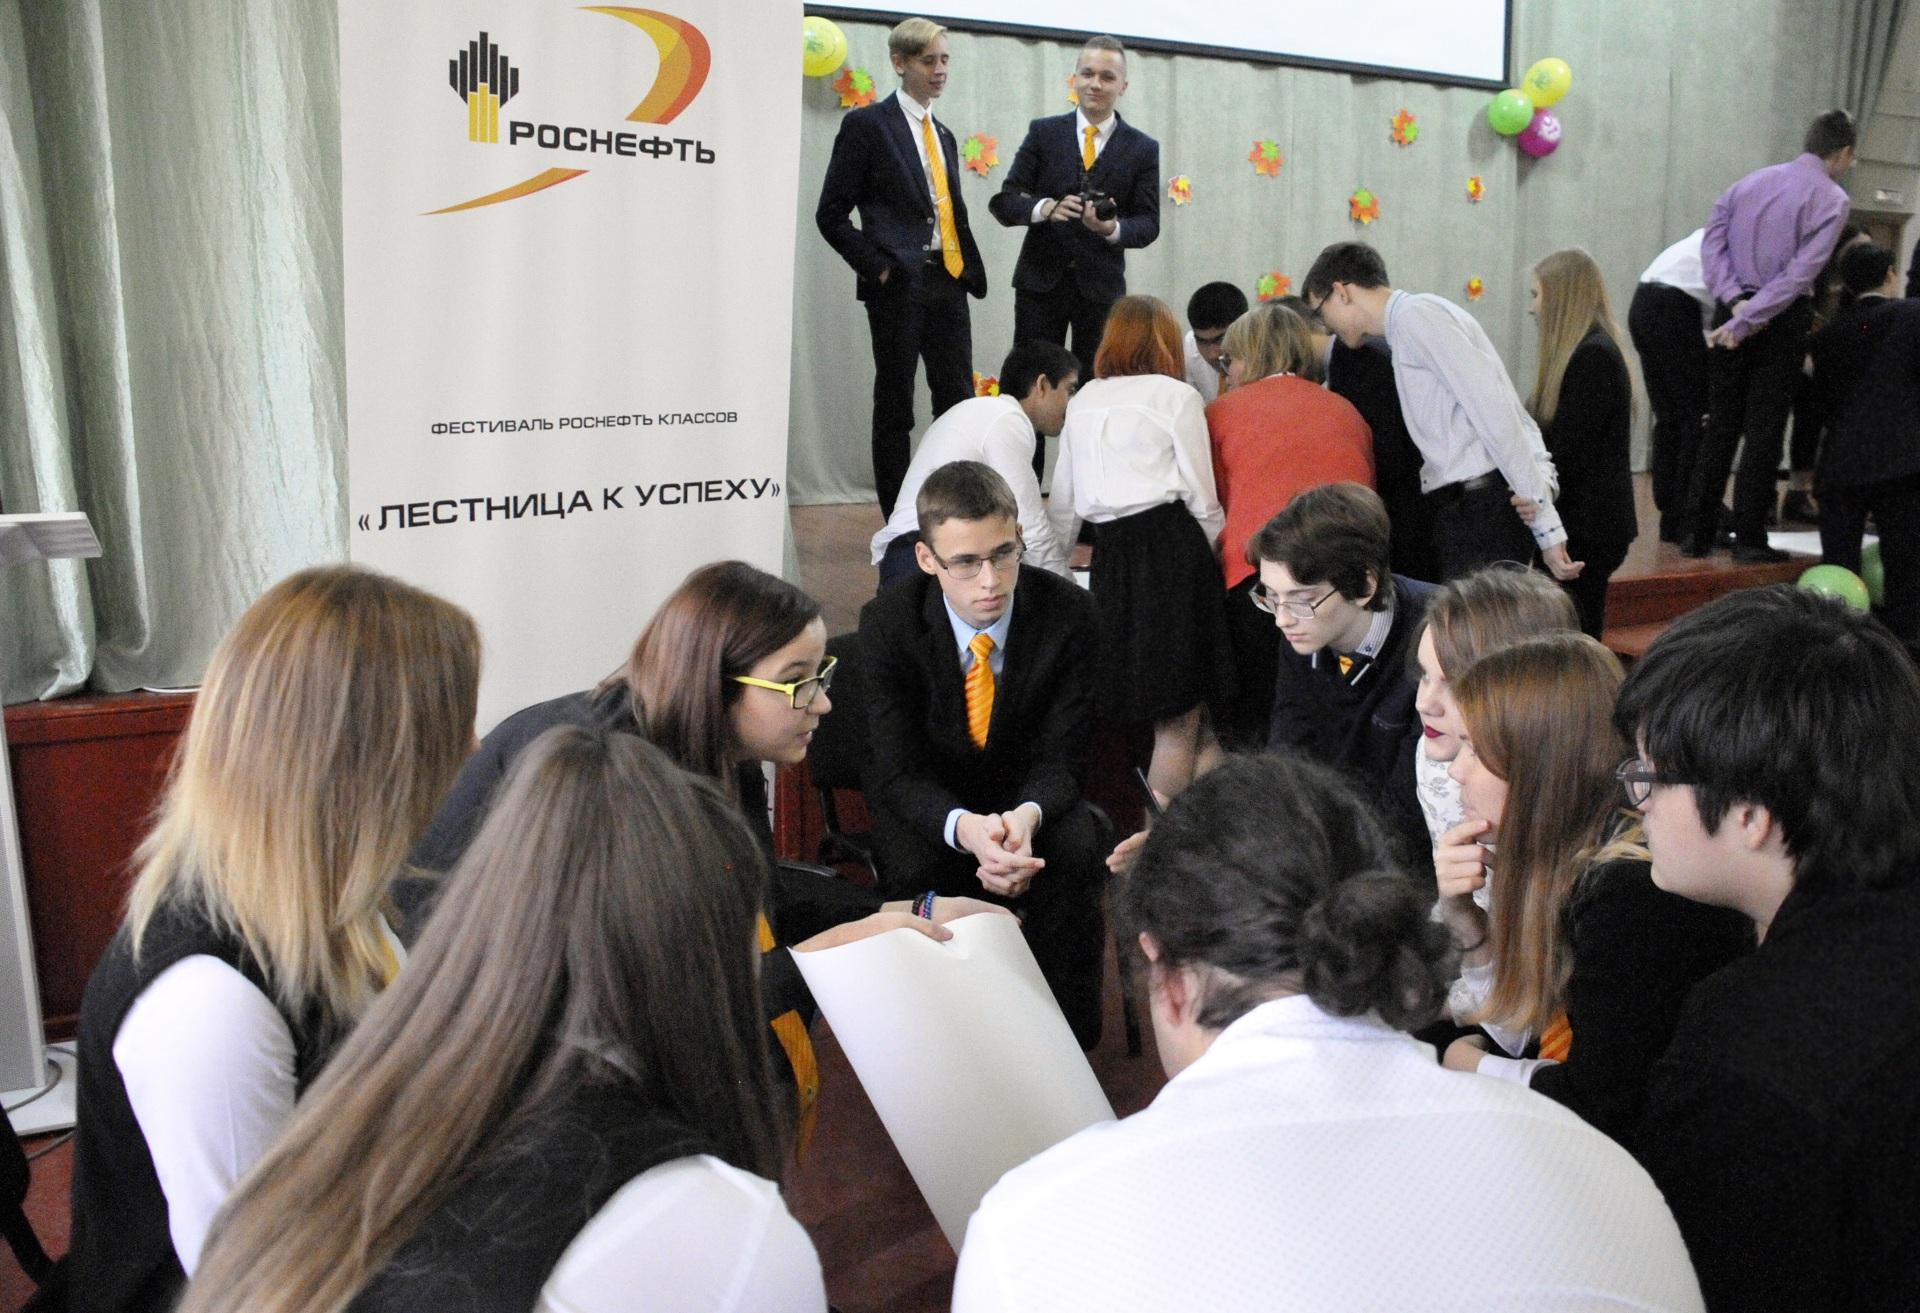 Schkolniki-na-korporativnom-treninge-Rosnefti-Lestniza-k-uspehu-(1).jpg